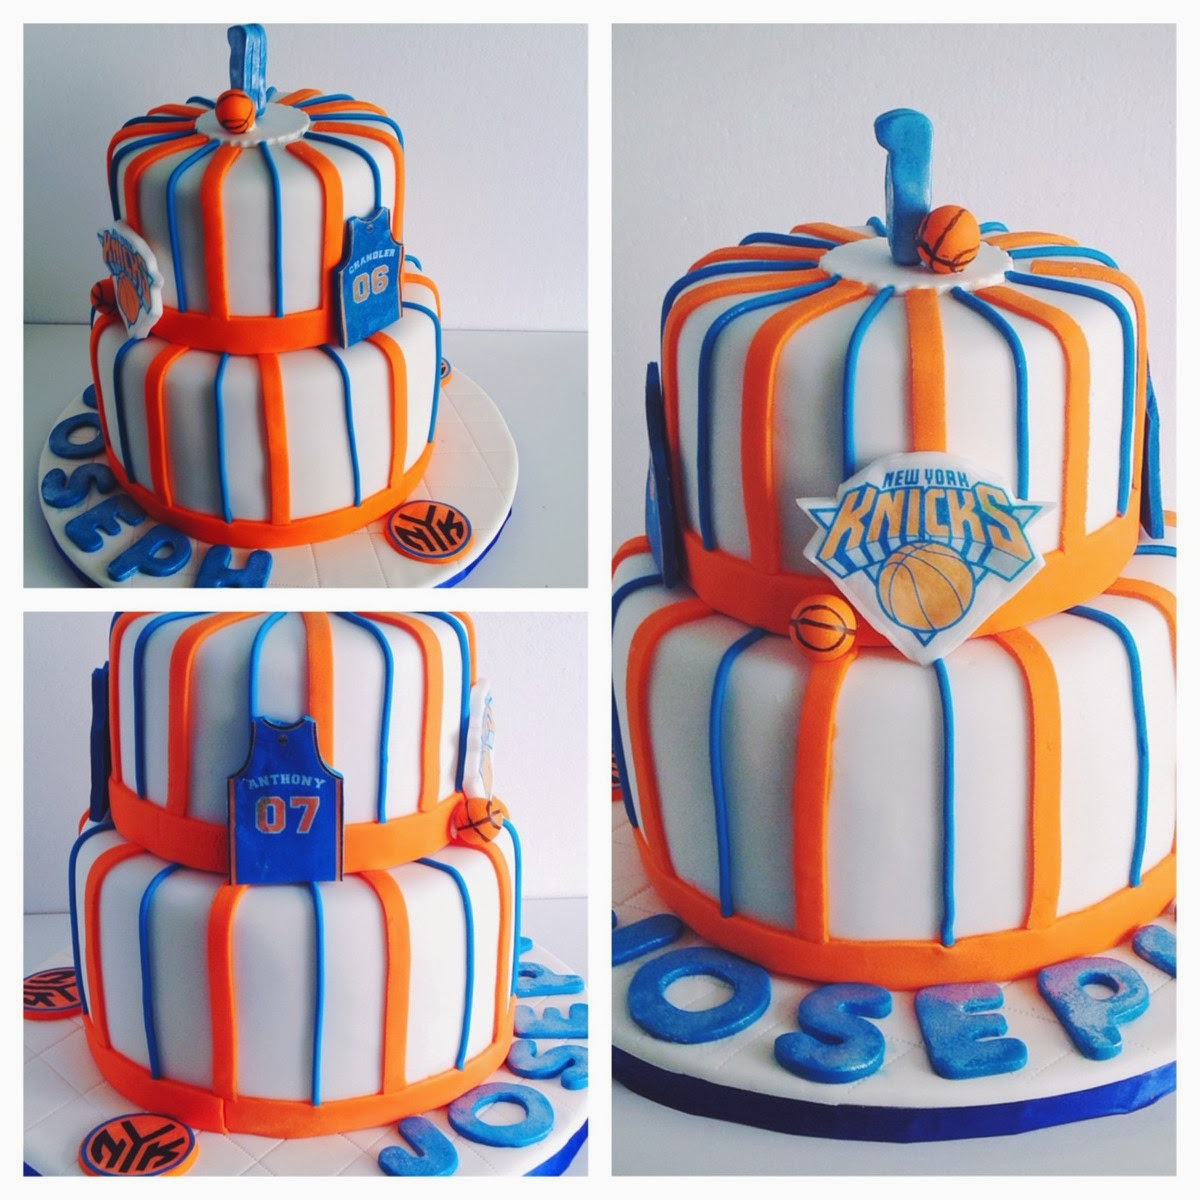 Lakers Themed Baby Shower: The Orange Apron Cakery: Custom Cakes